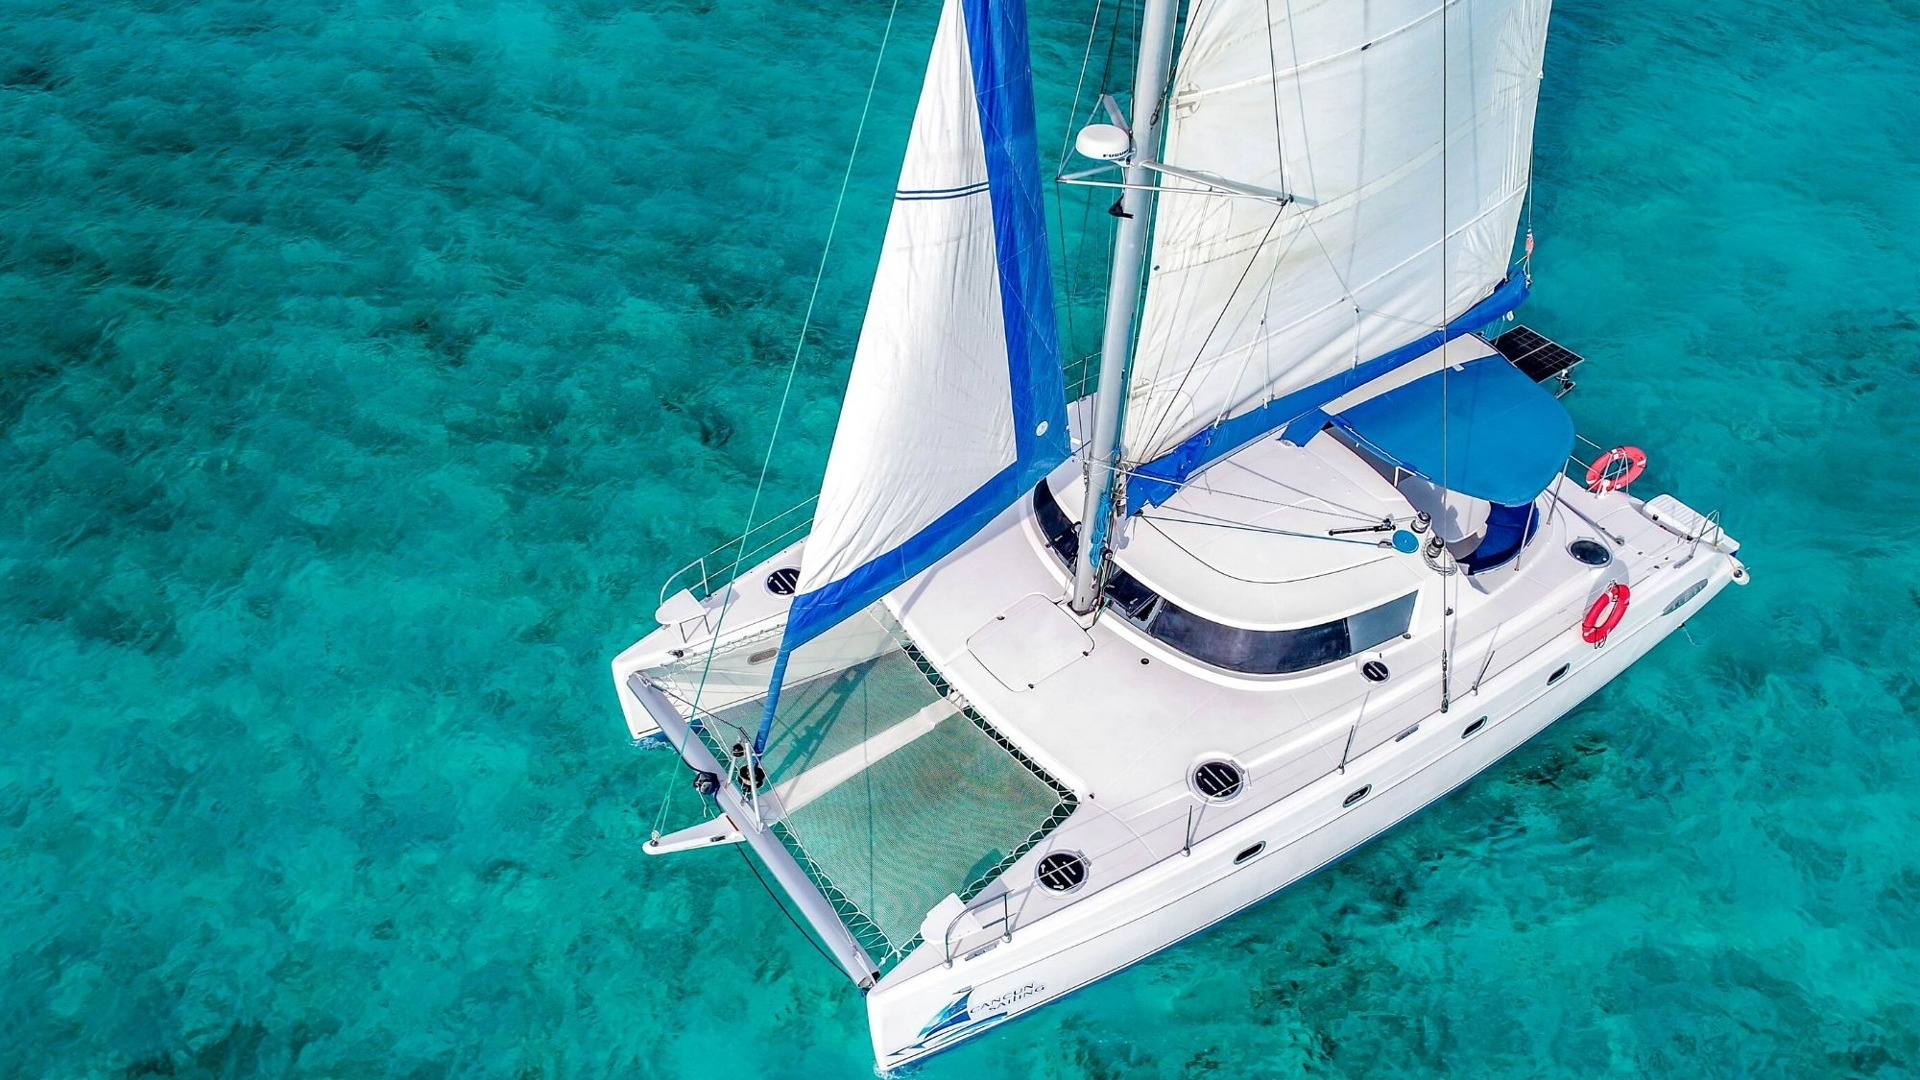 7 - LoRes - 4 Vents - Isla Mujeres Catamaran Tour - Cancun Sailing